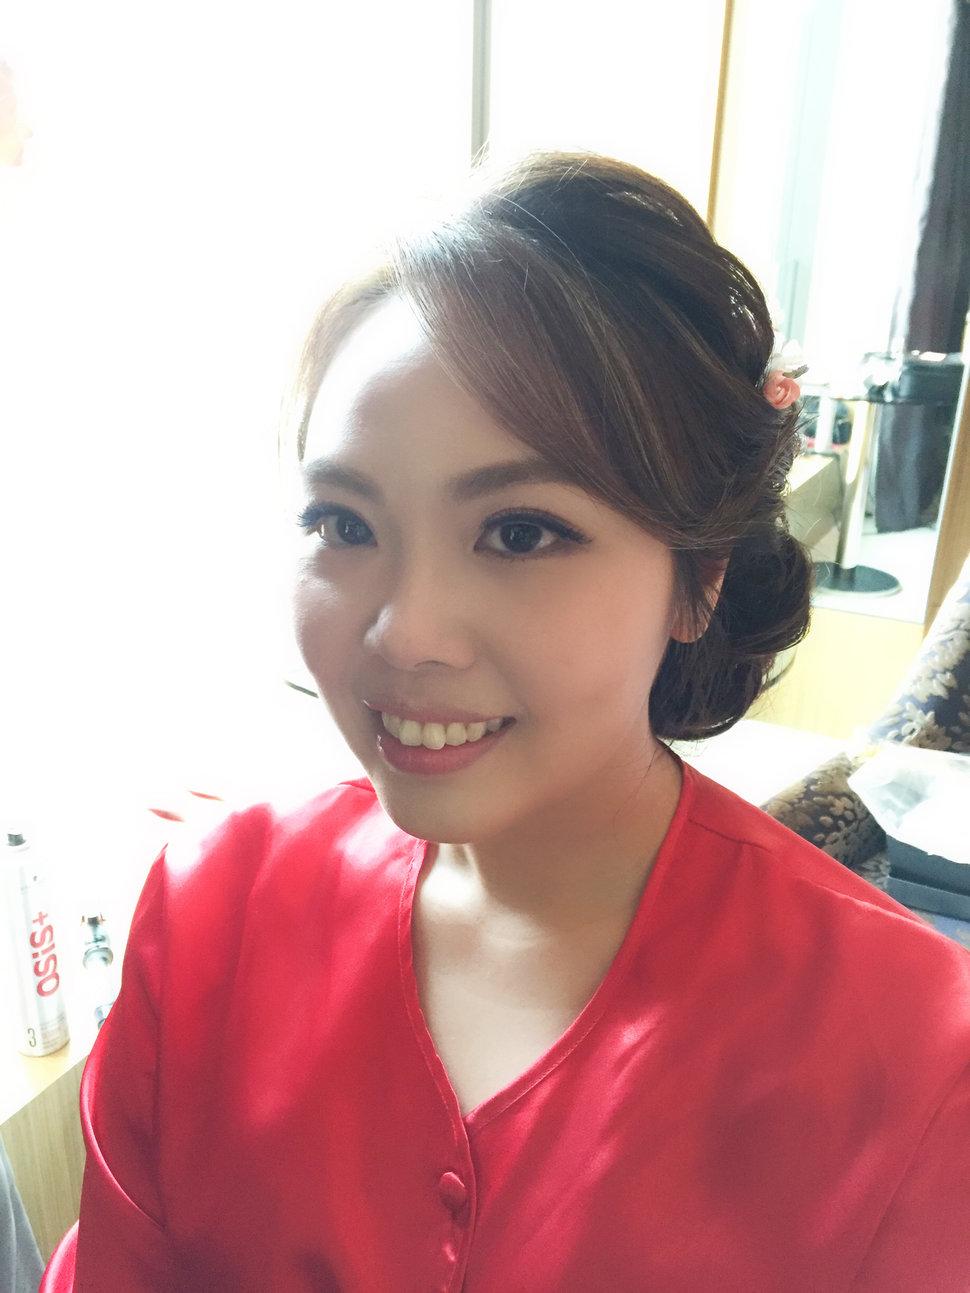 856BFD0C-943A-4BEE-97EA-4AF6BD5BD929 - Jojo chen Makeup新娘秘書《結婚吧》